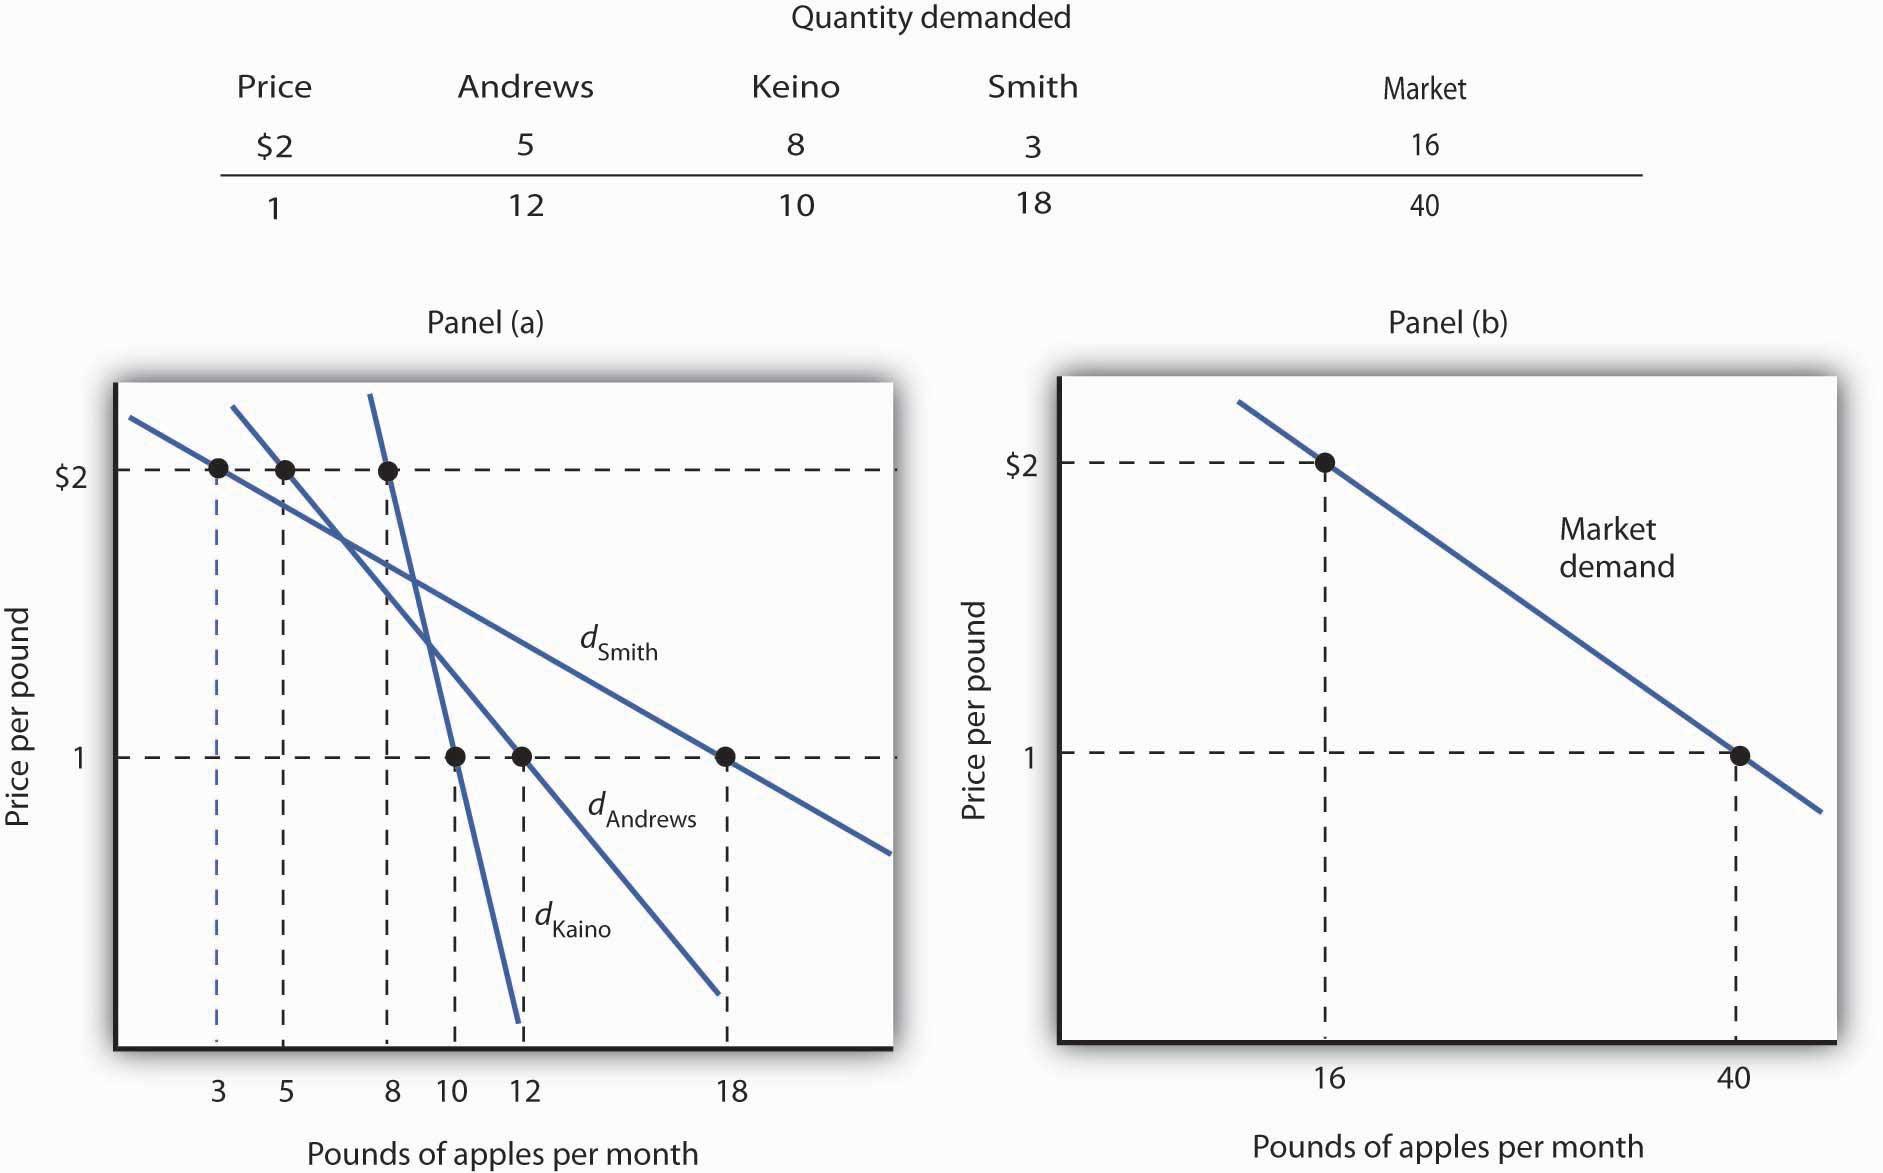 Deriving a Market Demand Curve